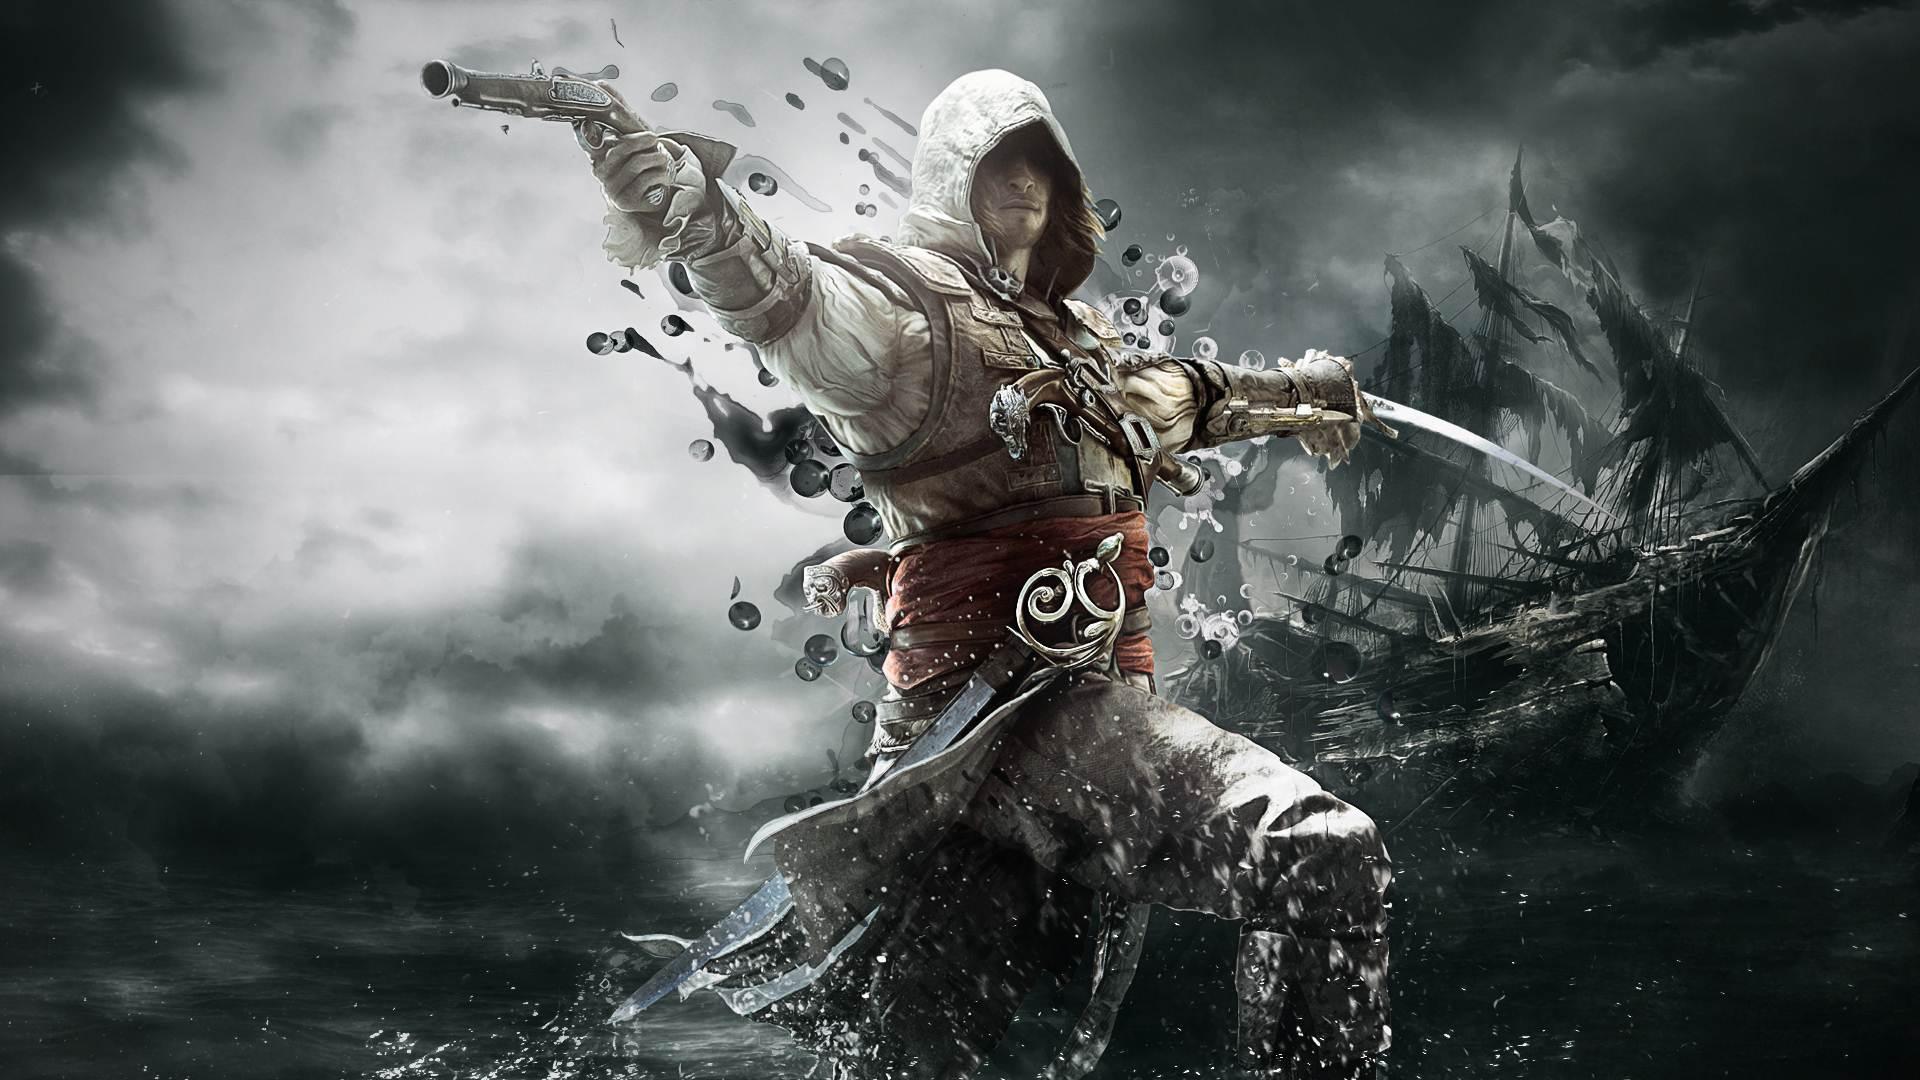 Próximo Assassin's Creed Na Grécia